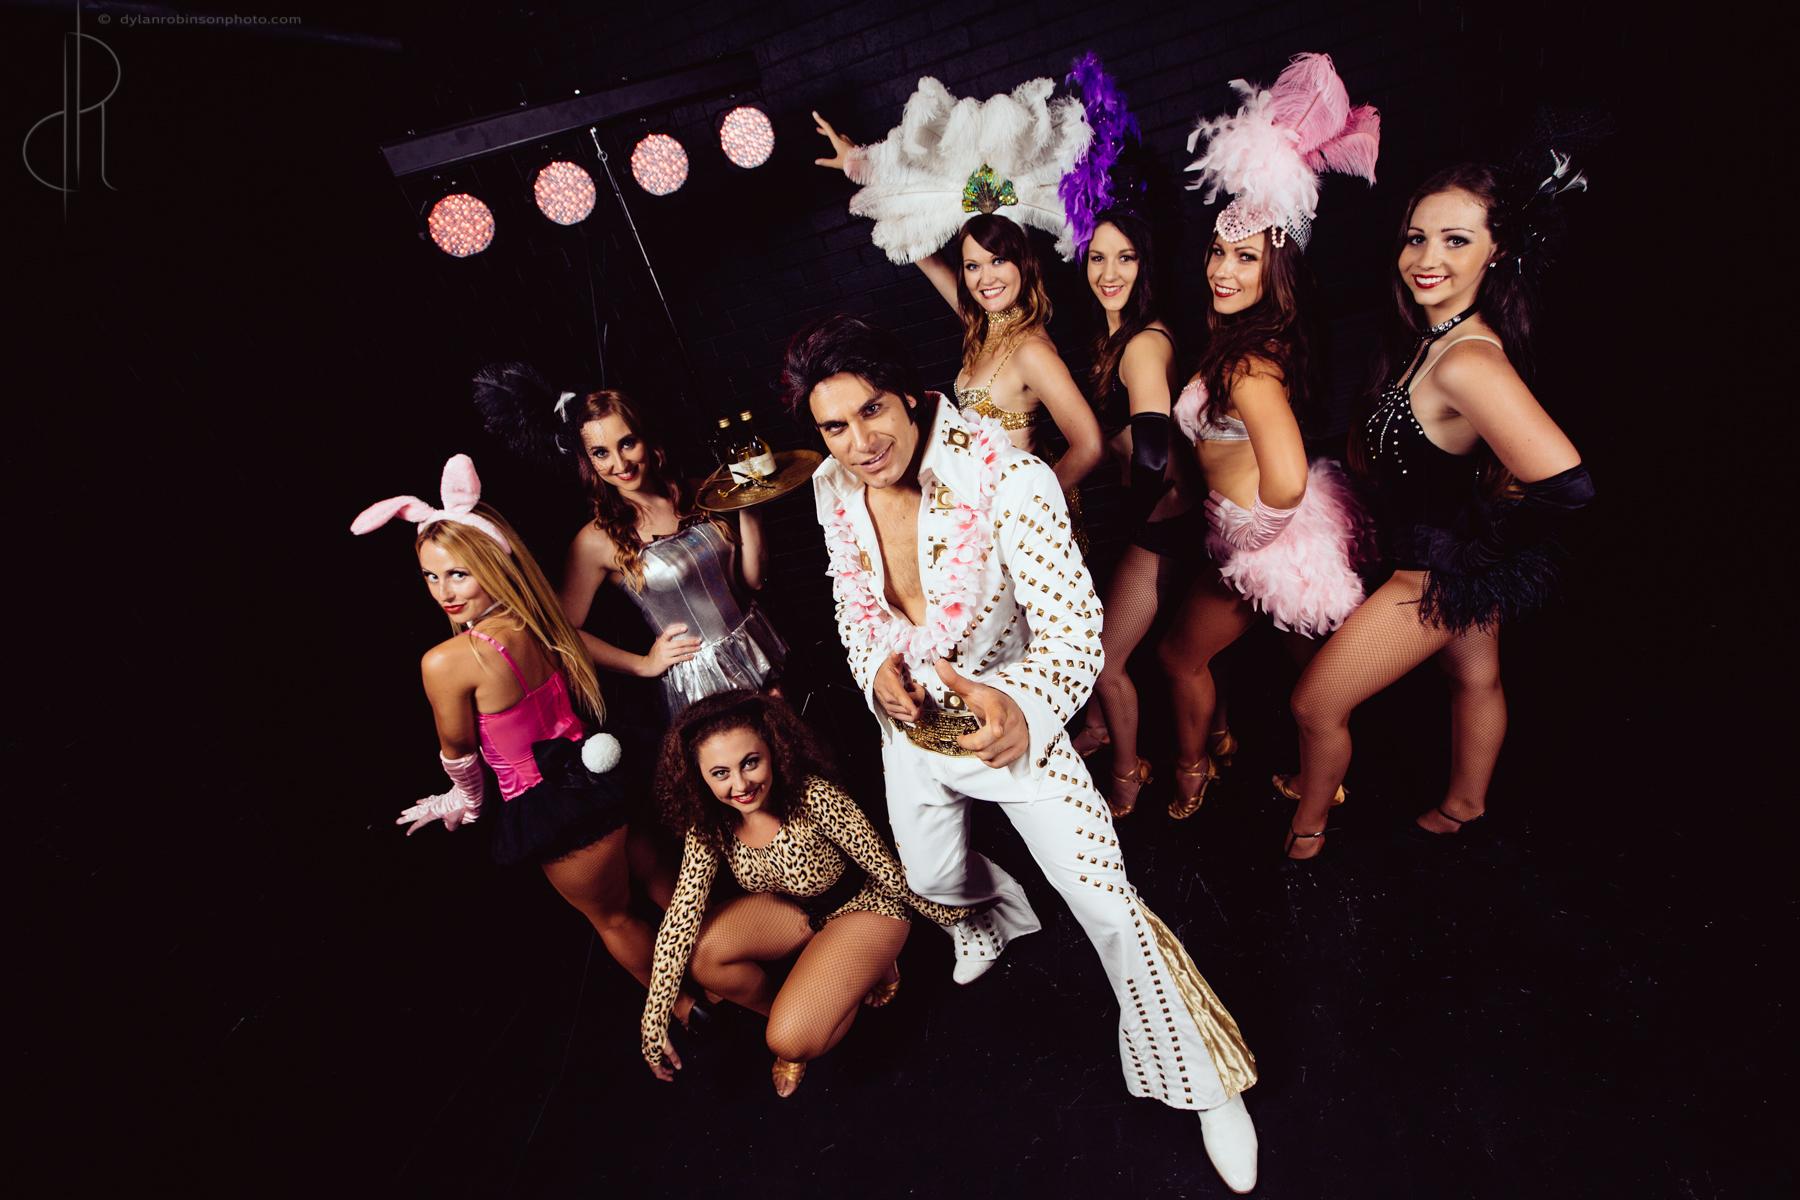 20140114_Dancers-Elvis_005